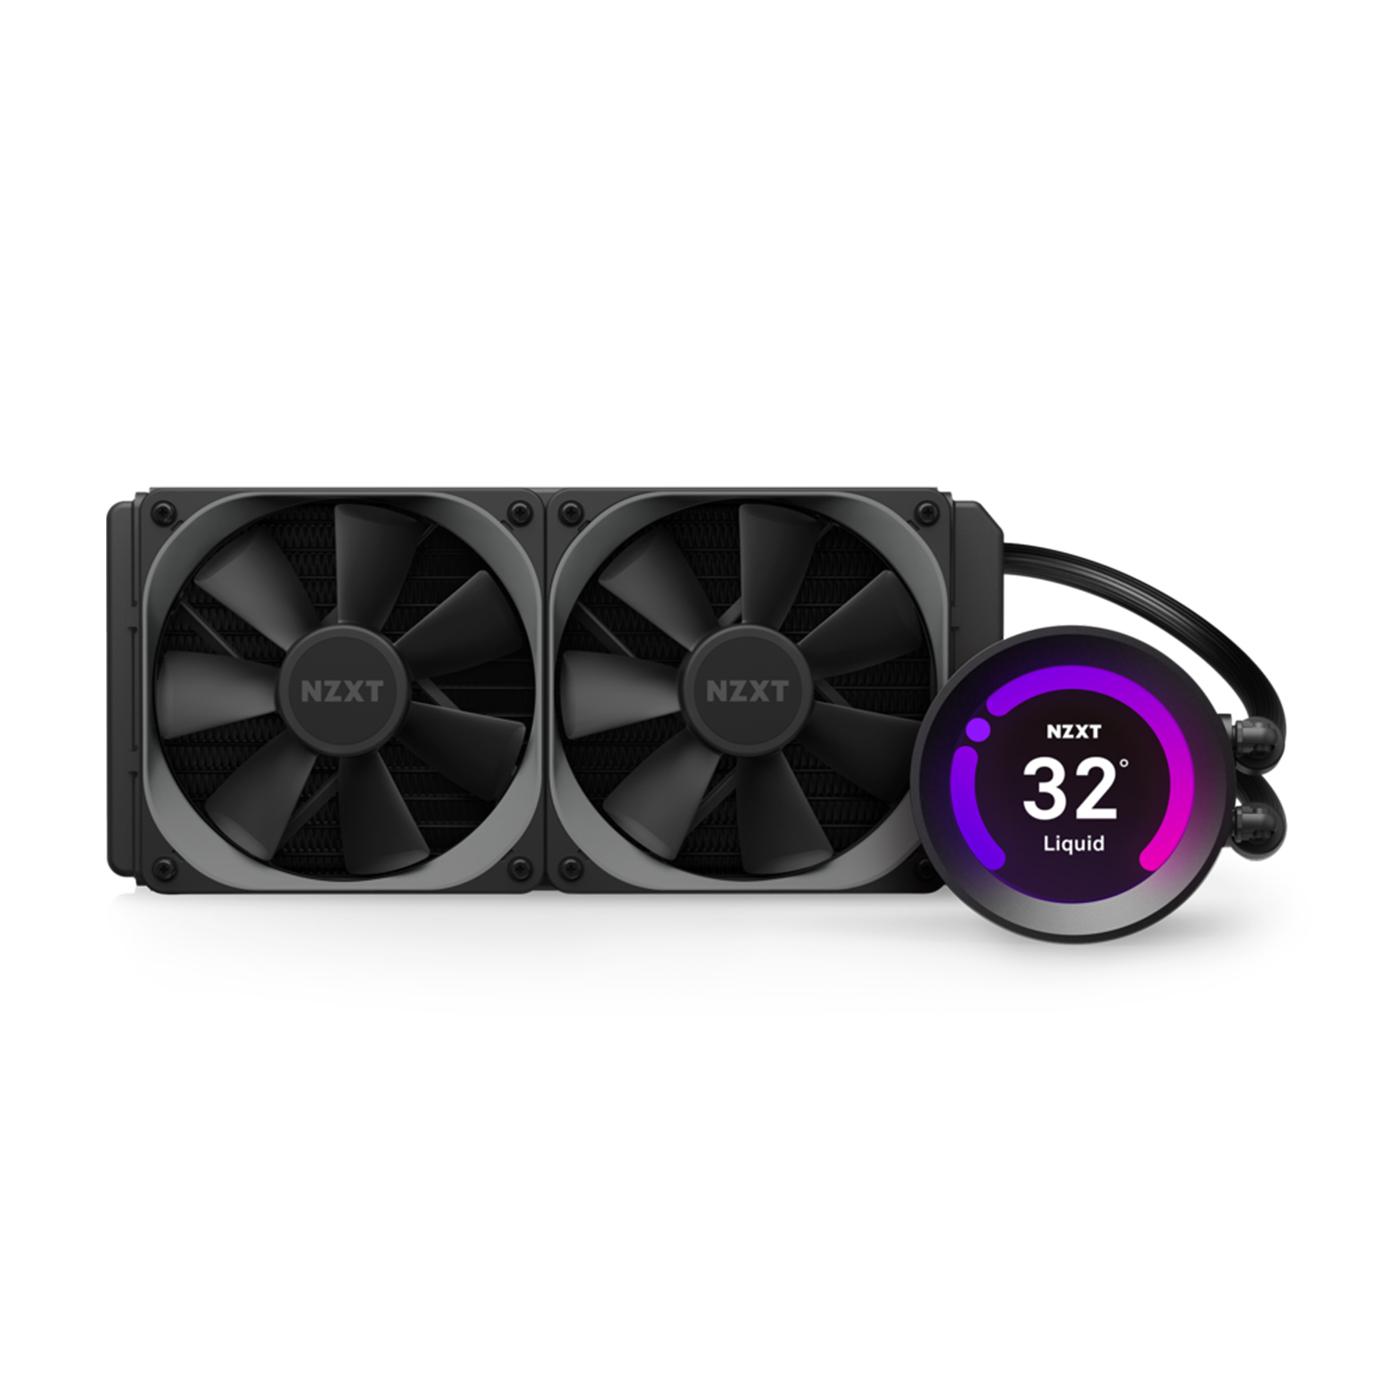 NZXT KRAKEN Z53 (240MM) RGB Variable Speed Liquid Cooler – (Includes AM4 Bracket & Hue 2) - NZXT 2.31.62.00.057